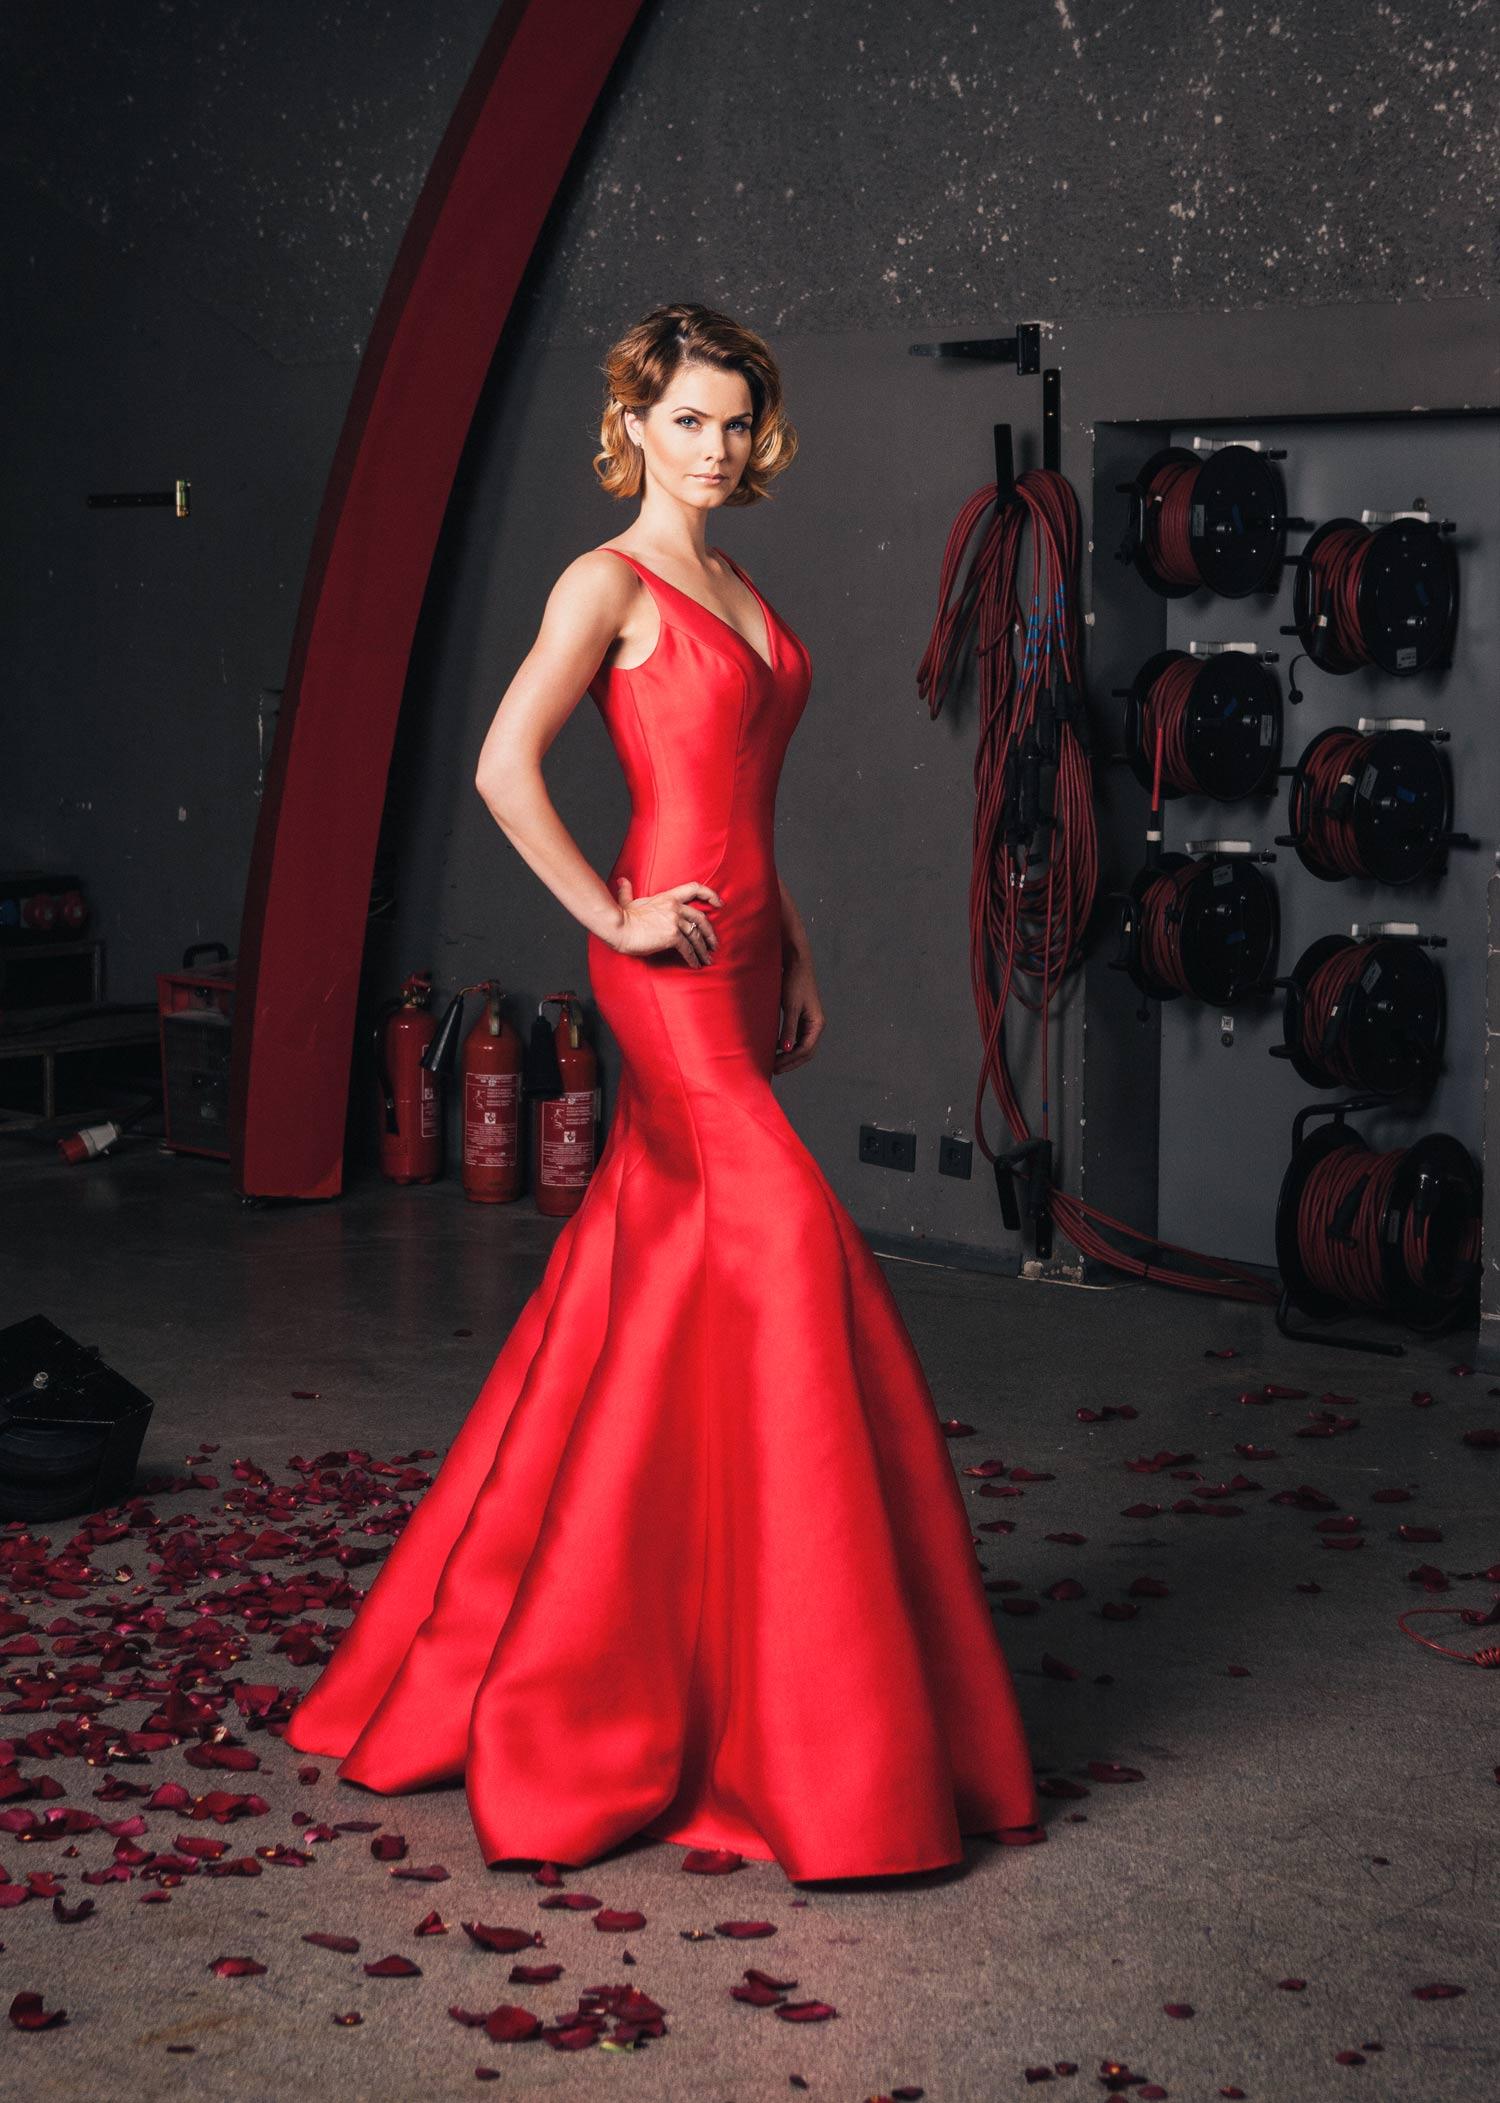 <p>Lina Kairytė<br /> Tv host<br /> Žmonės magazine<br /> Lithuania<br /> 2015</p>